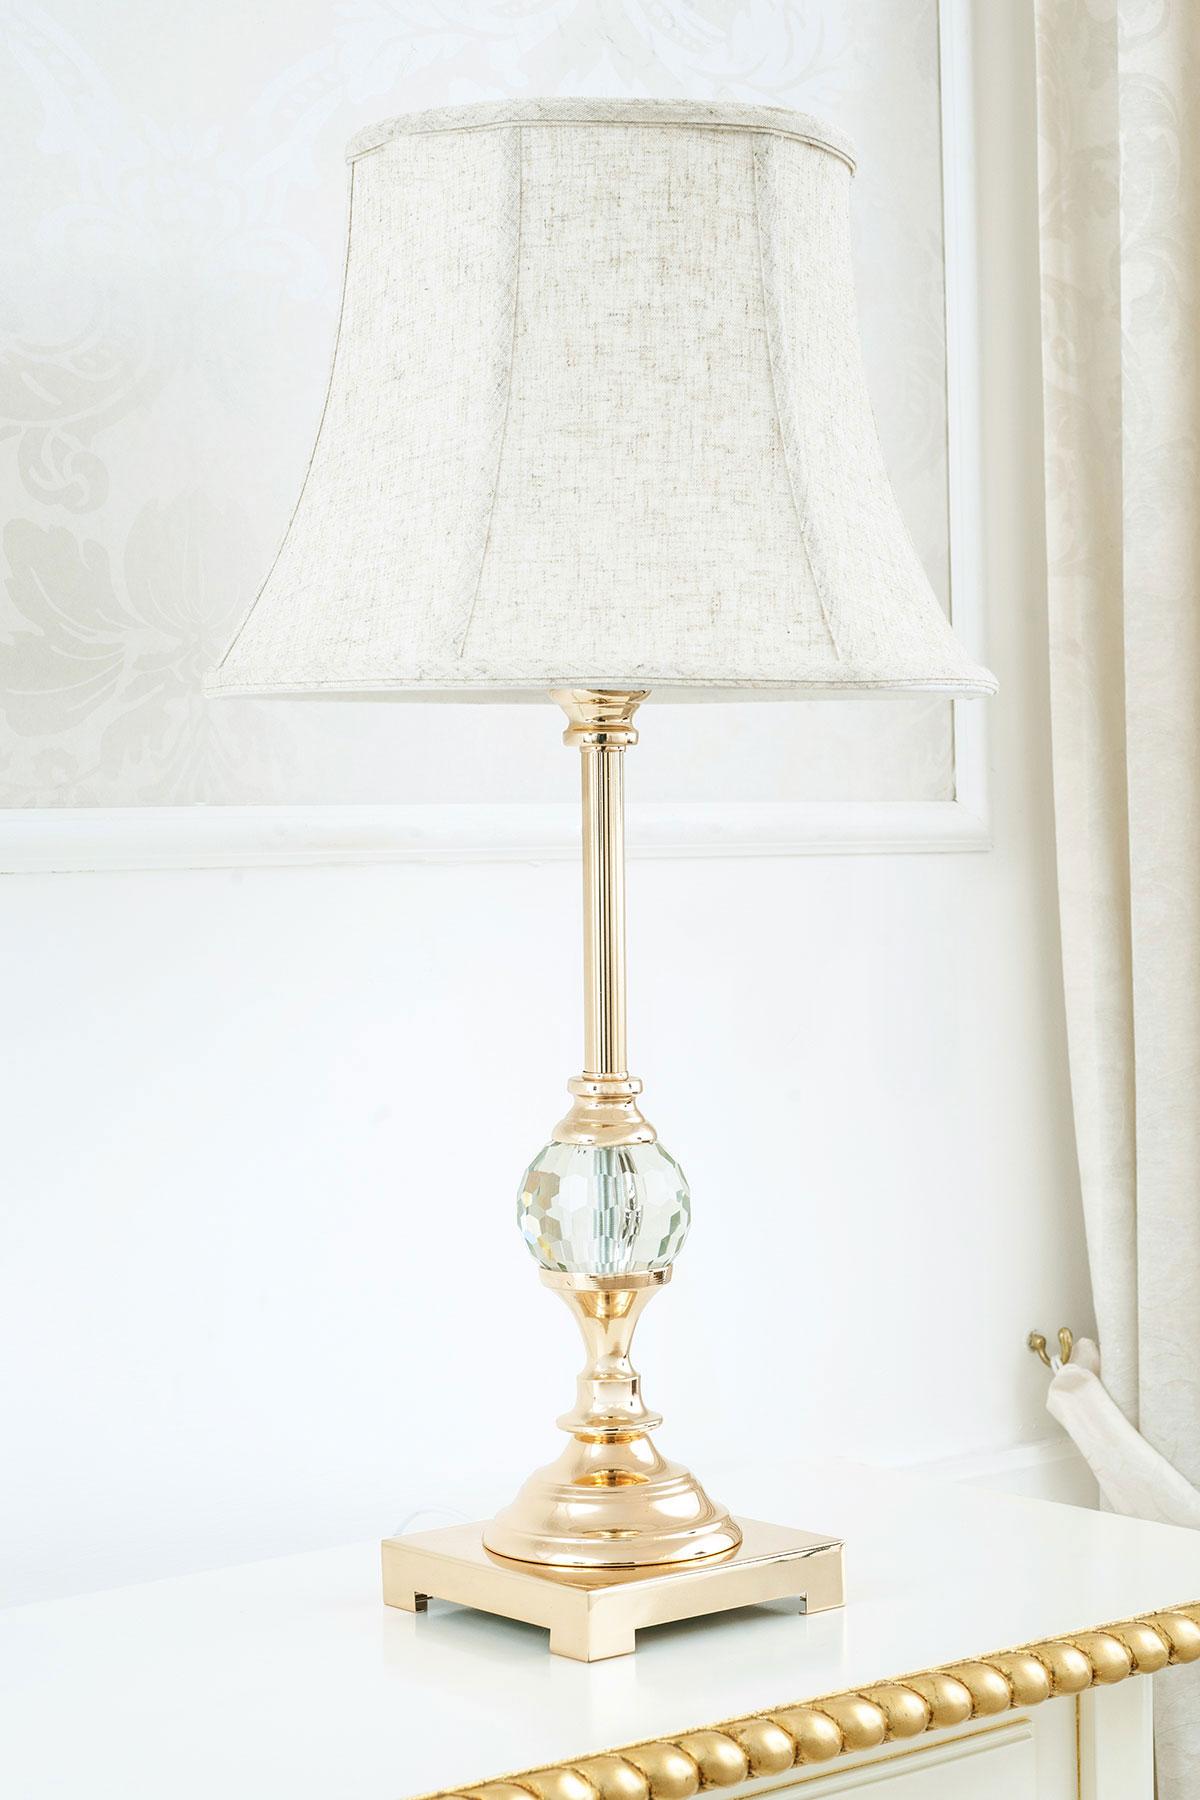 abatjou con sobremesa clásica Lámpara panta con Roxanne de de oro Detalles cristal en esfera E2DHWIY9